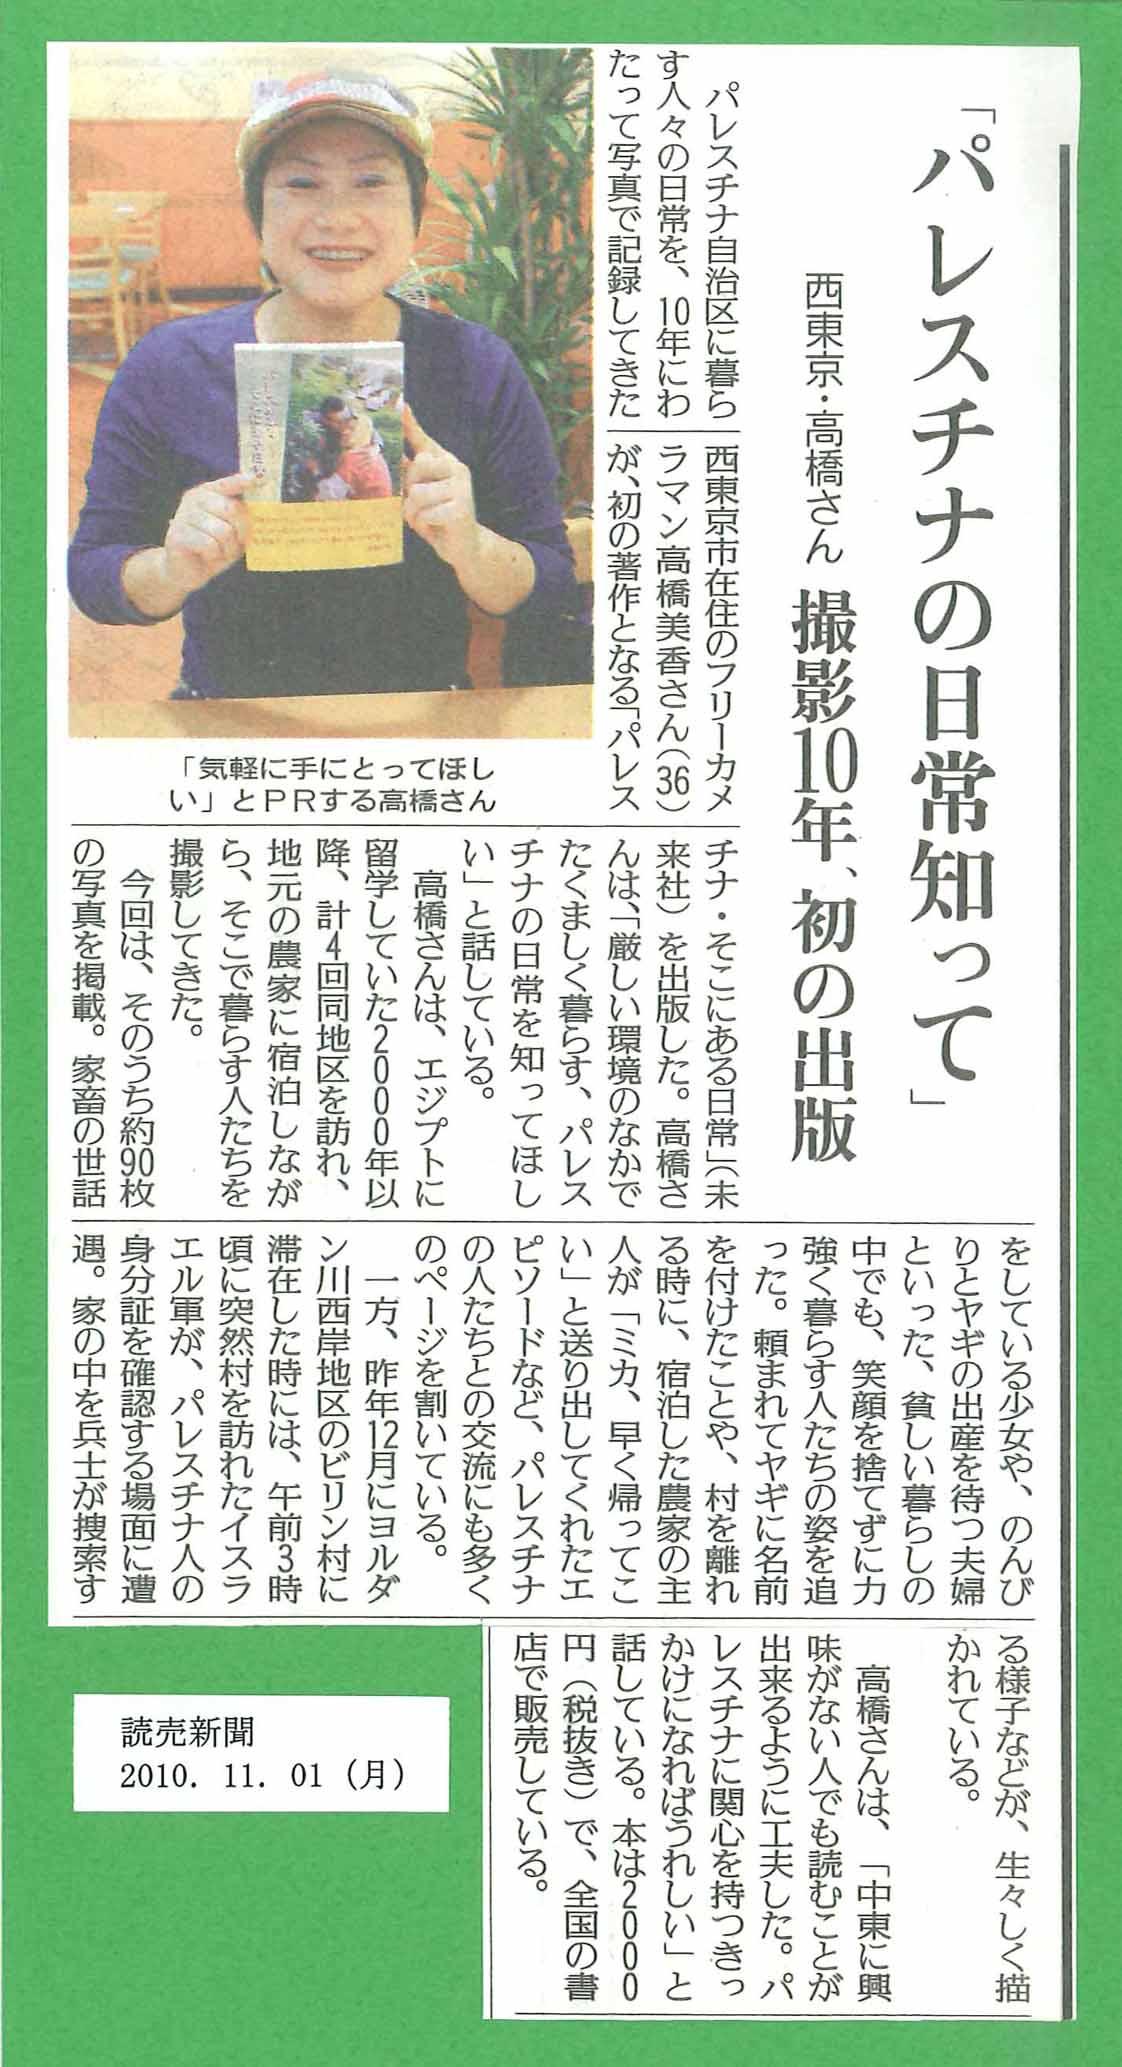 http://www.miraisha.co.jp/topics/2010/11/09/takahashimika_kiji.jpg